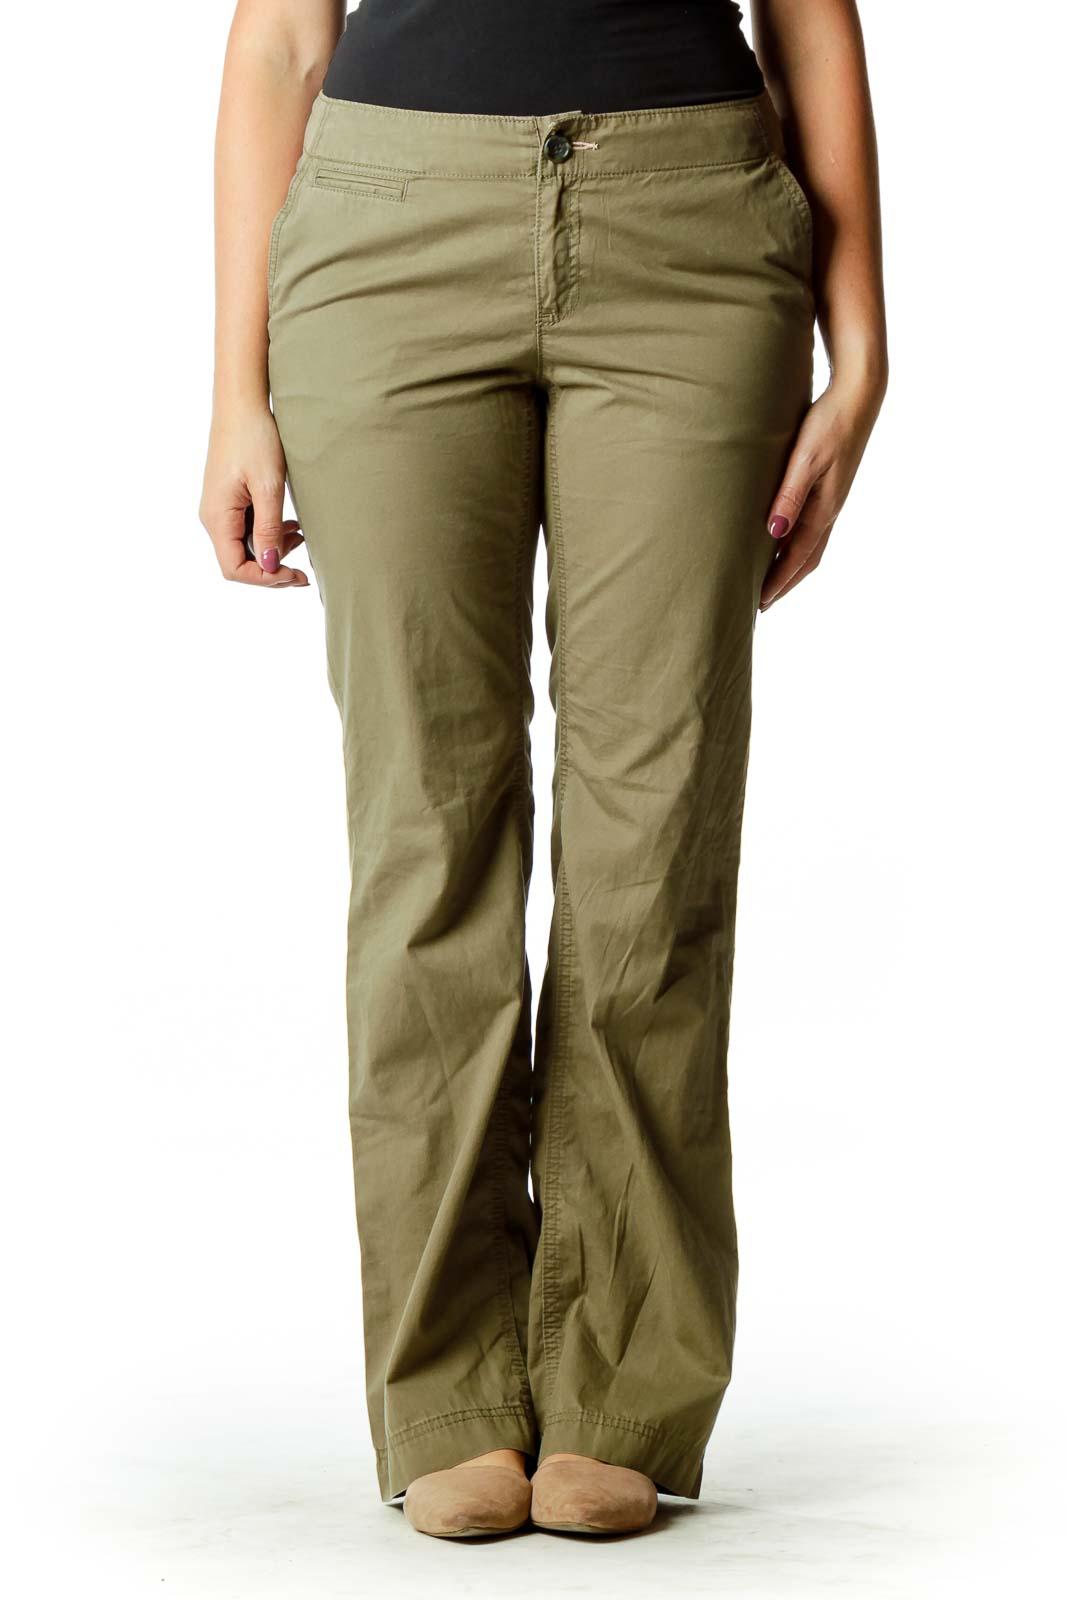 Olive Green Straight Leg Pants